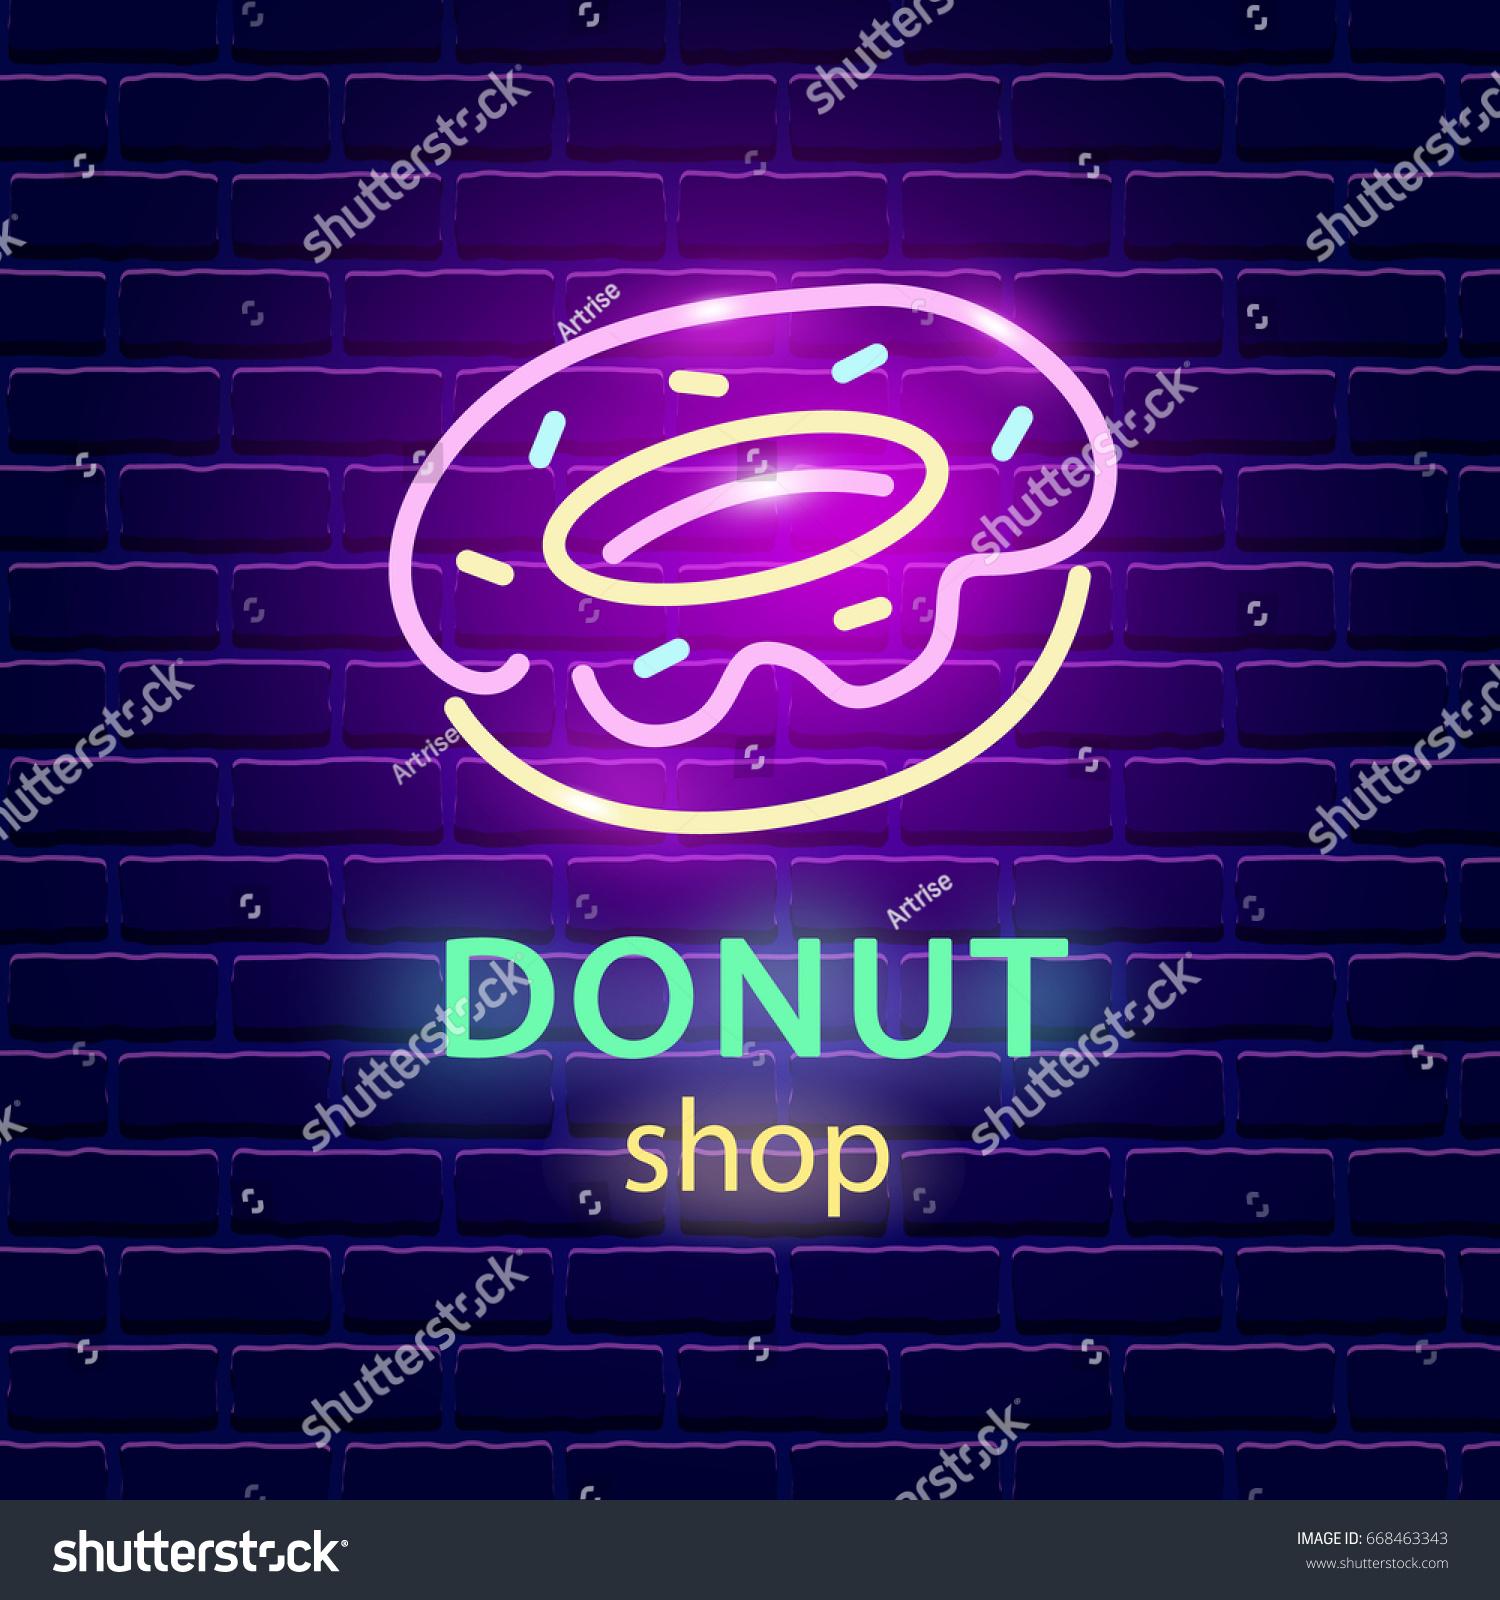 Donut Shop Neon Logo Sign On Stock Vector 668463343